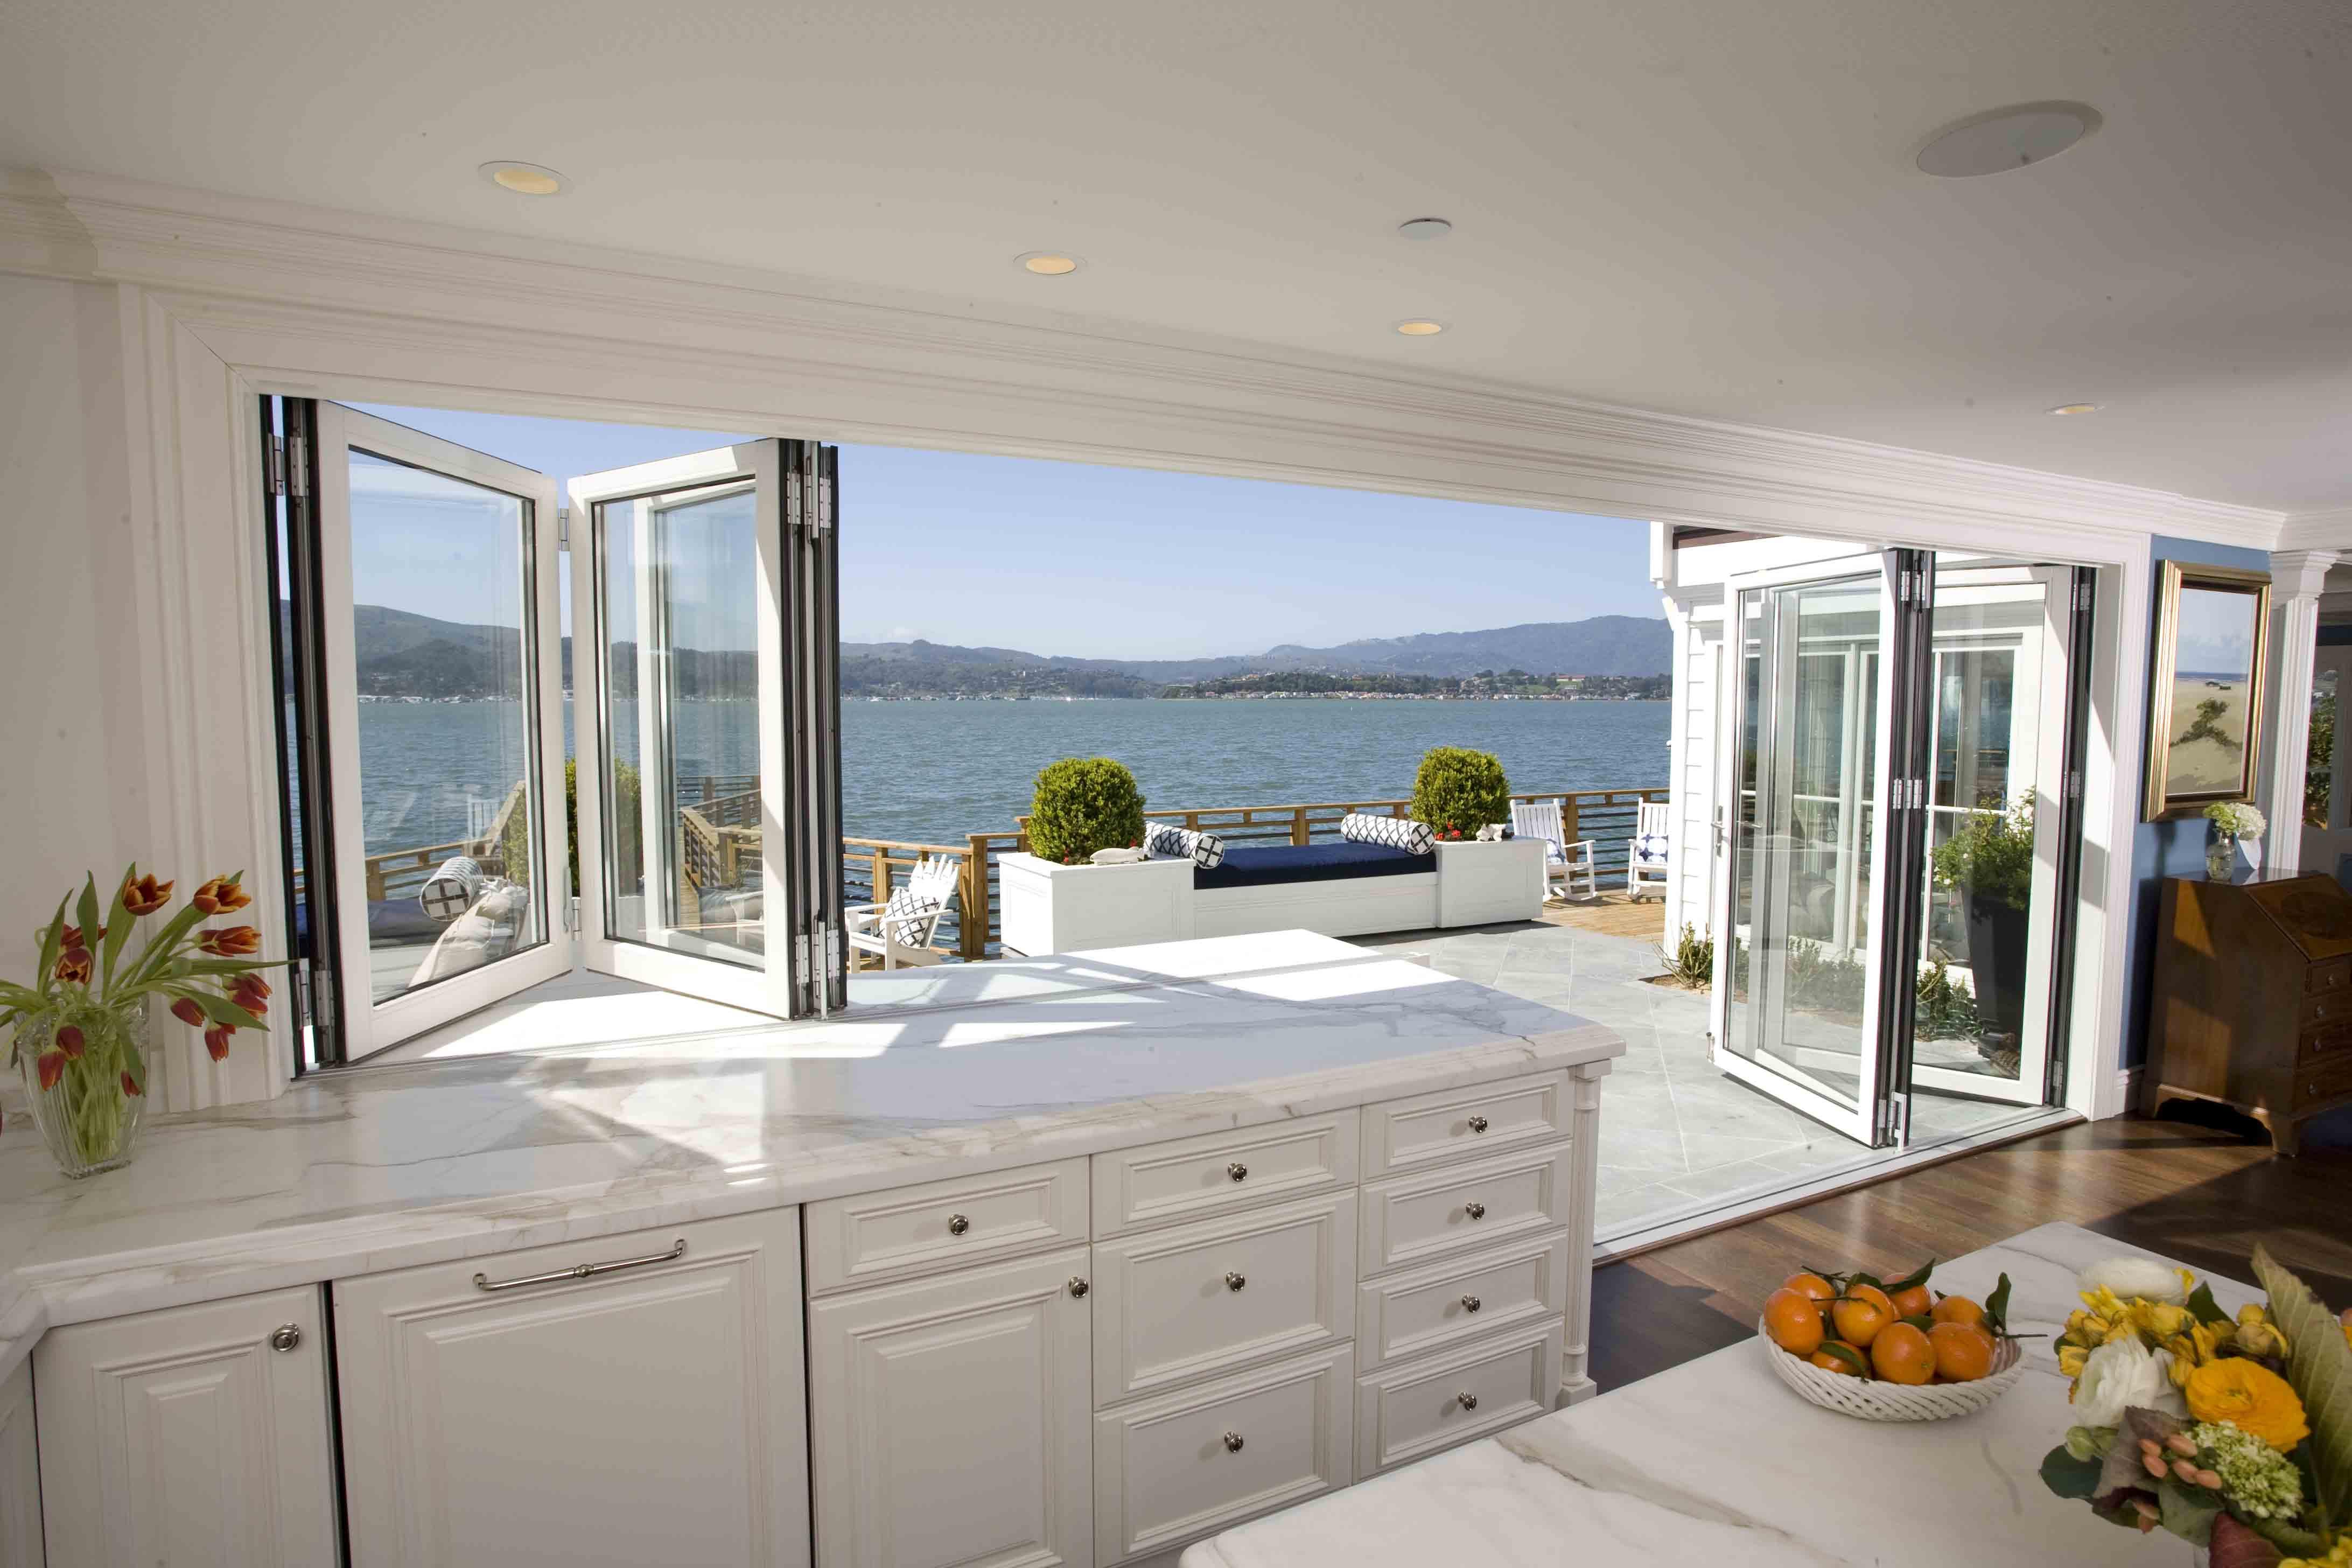 NanaWall® Kitchen Transition, New Trend in Kitchen Design ...